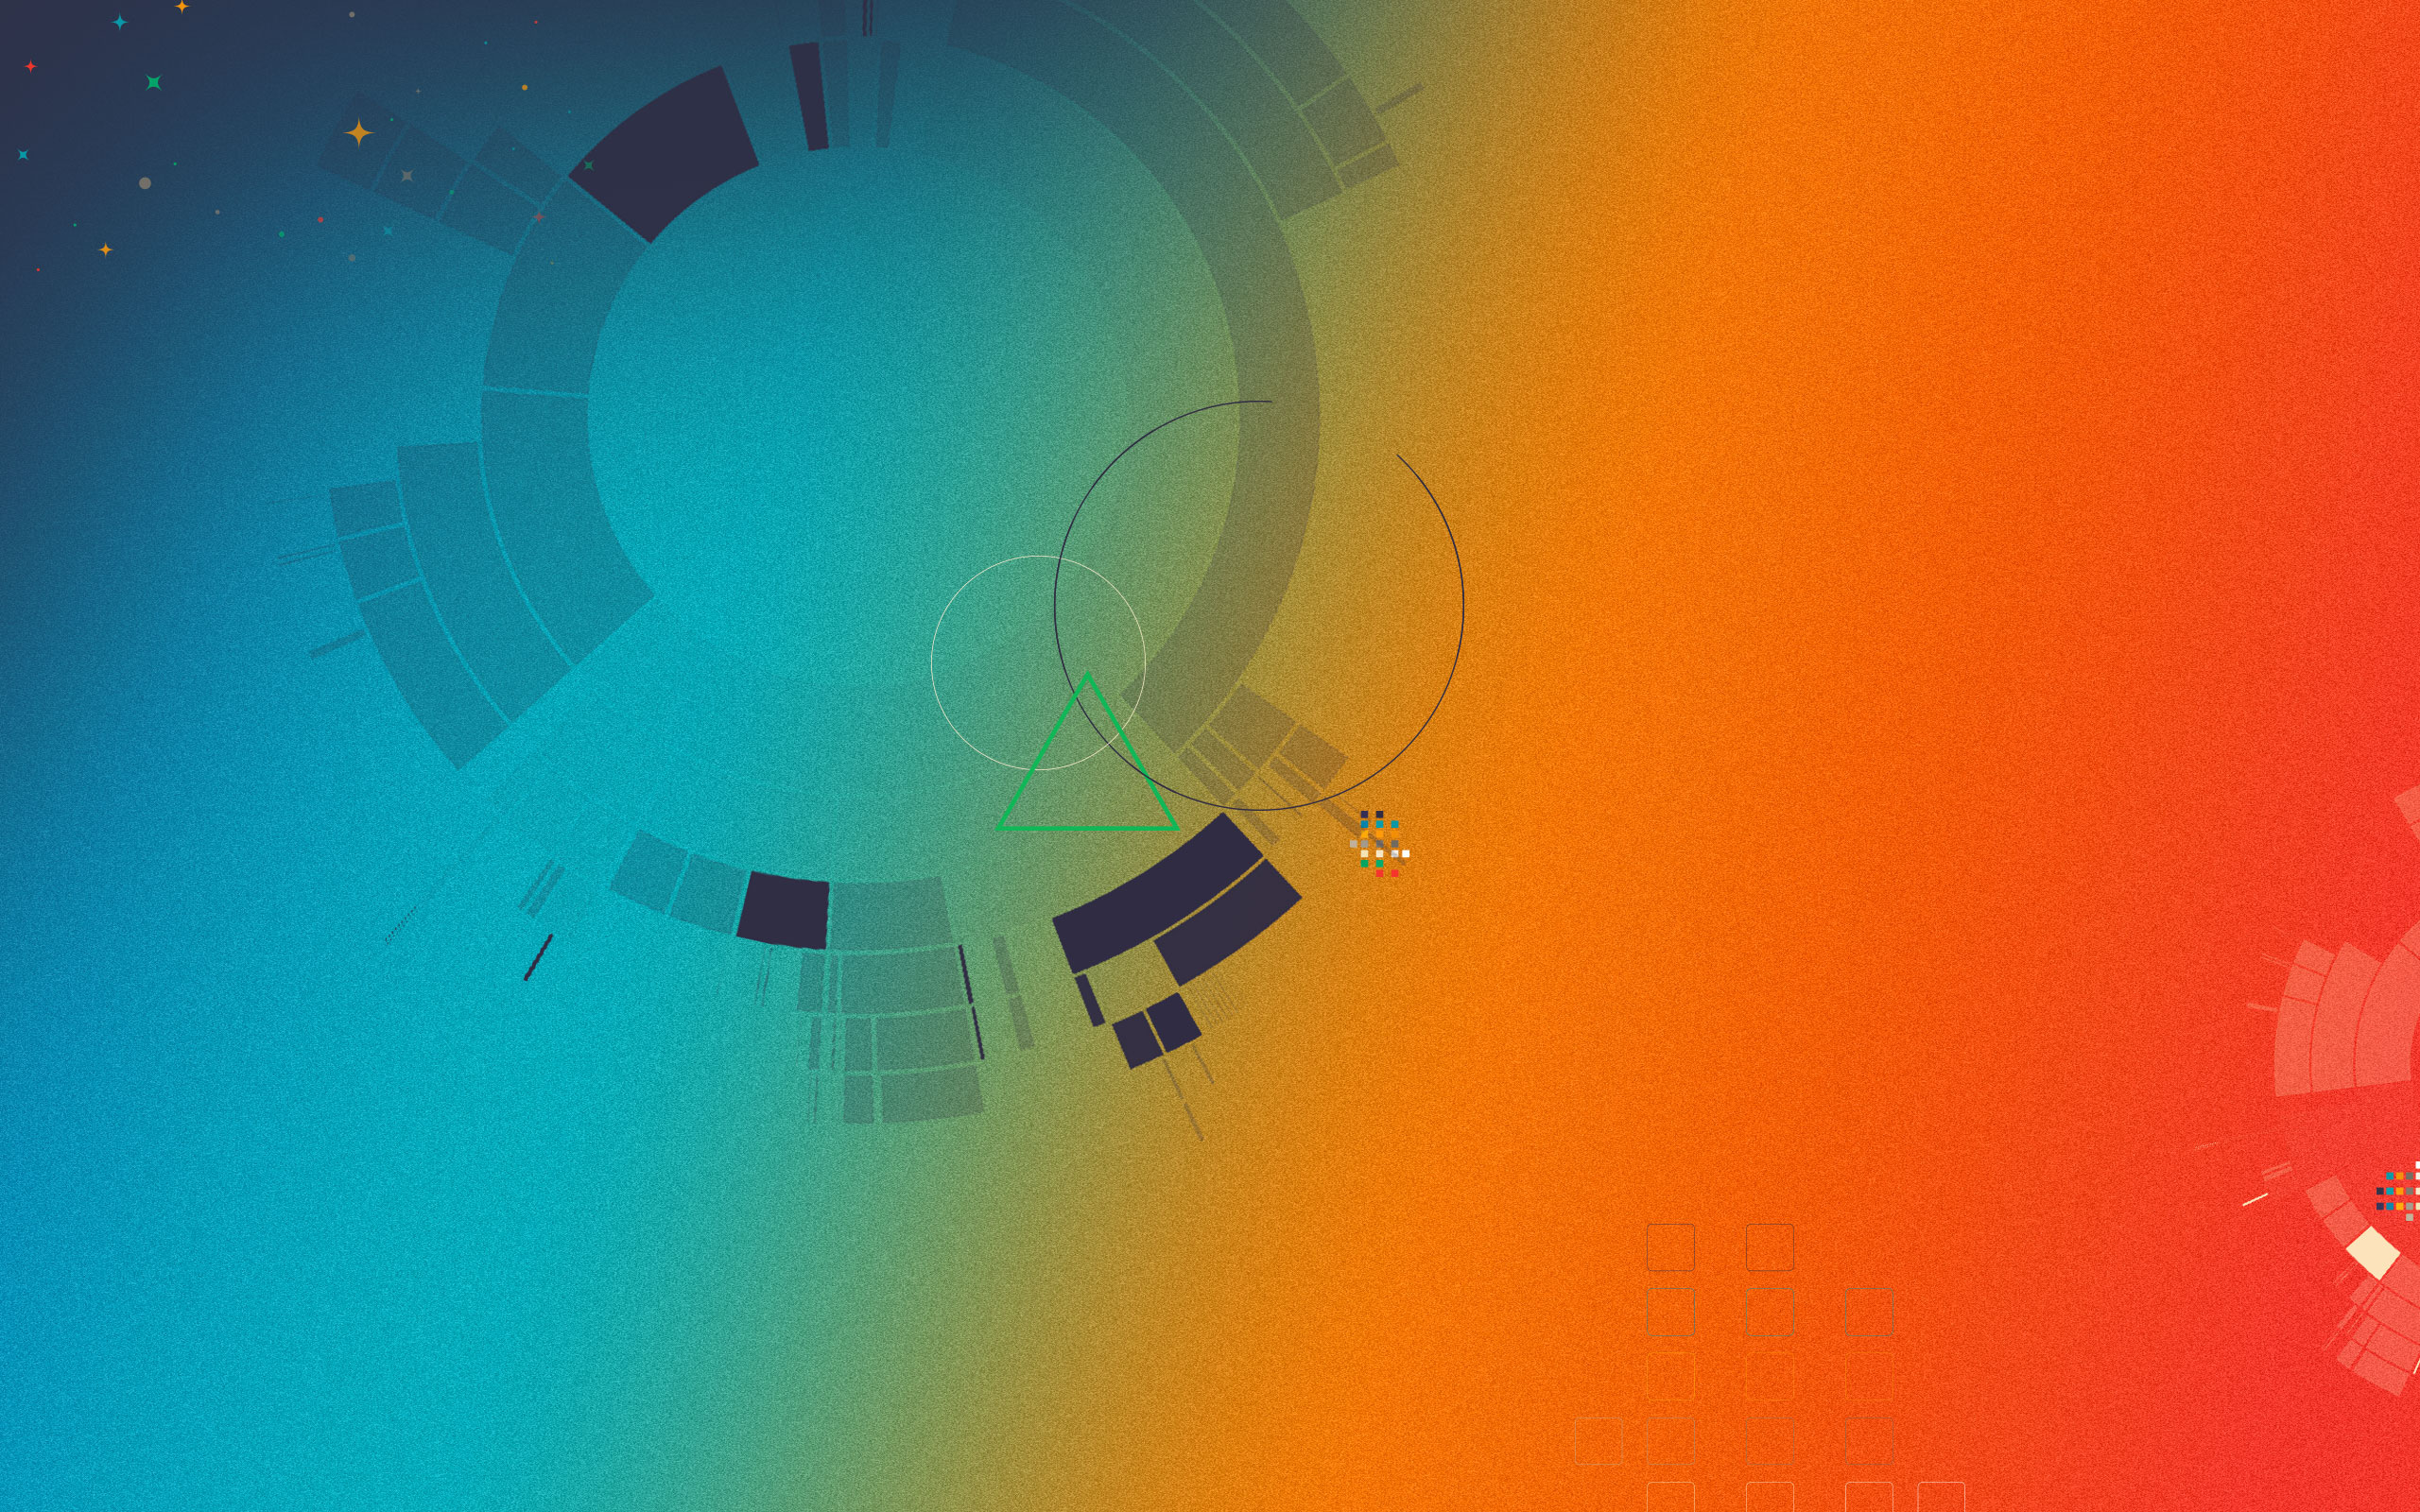 Astronomer v0 8 0 Release Notes